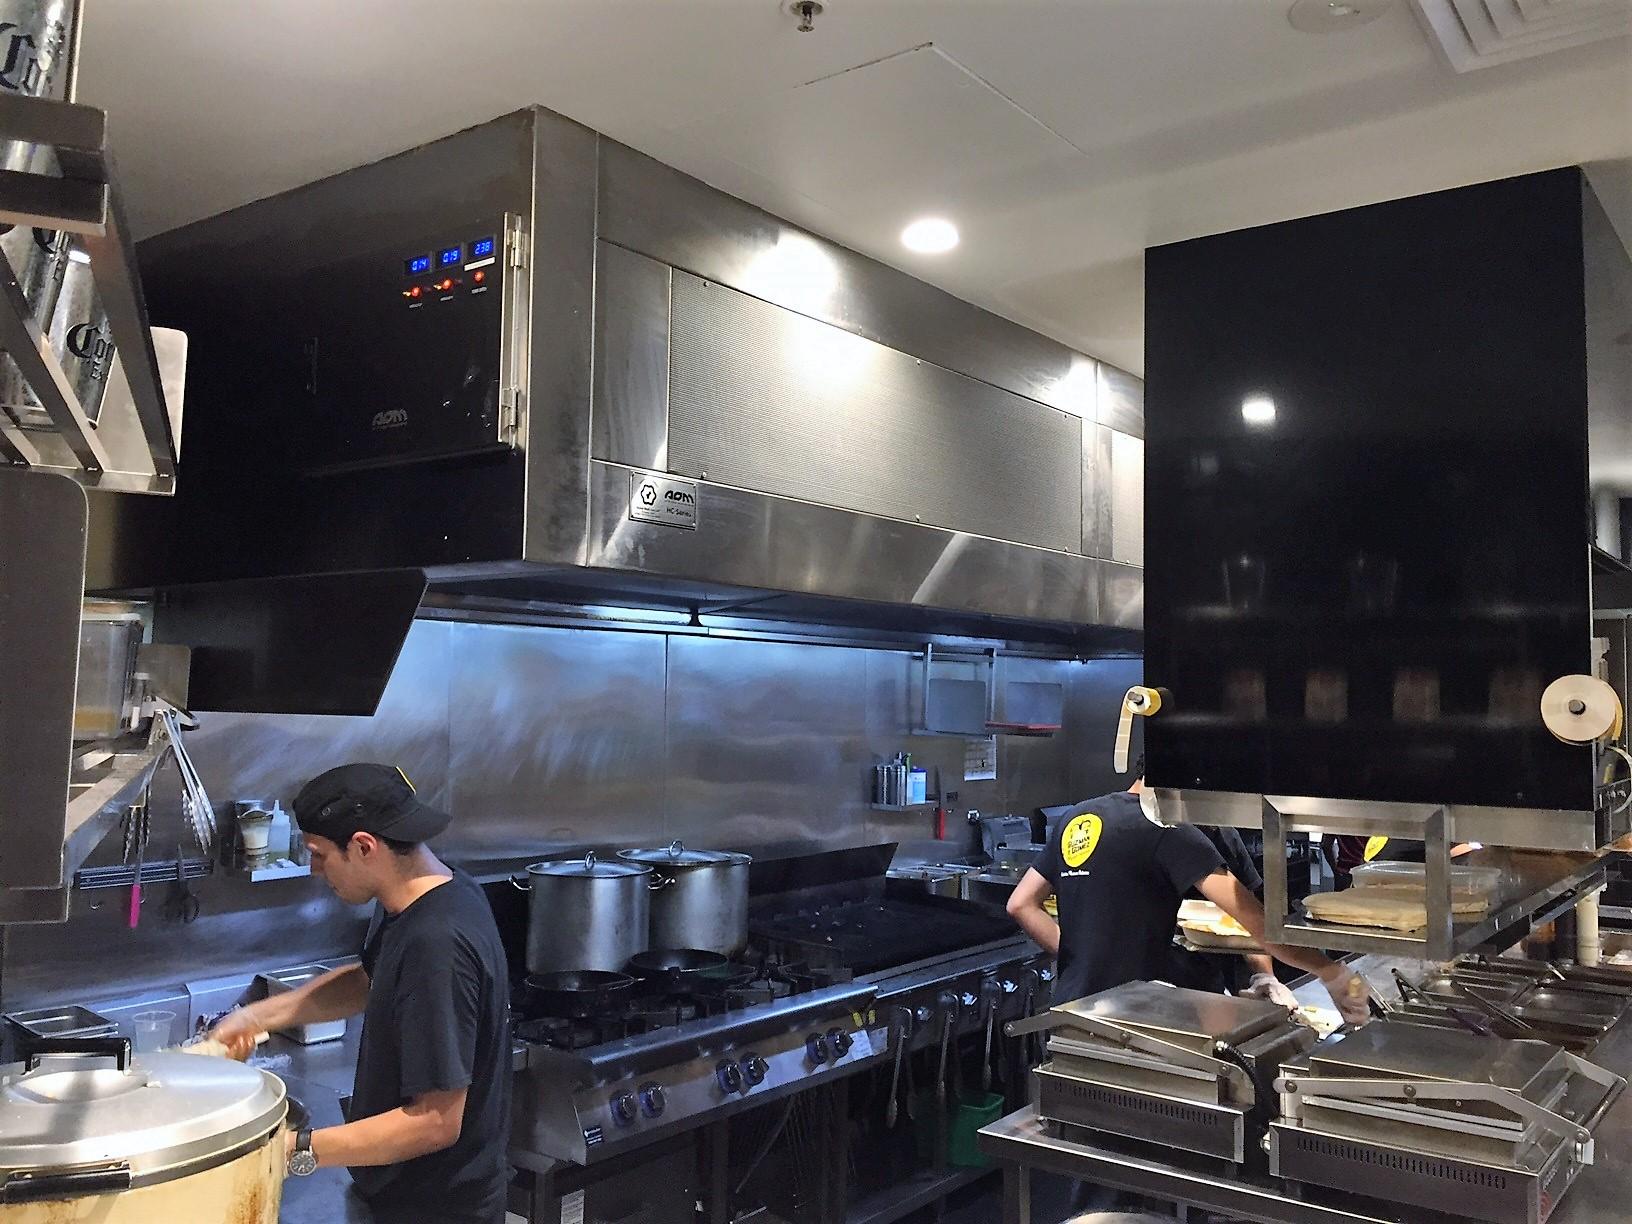 Aom Hcfo Series Kitchen Exhaust Hood Air Amp Odour Management